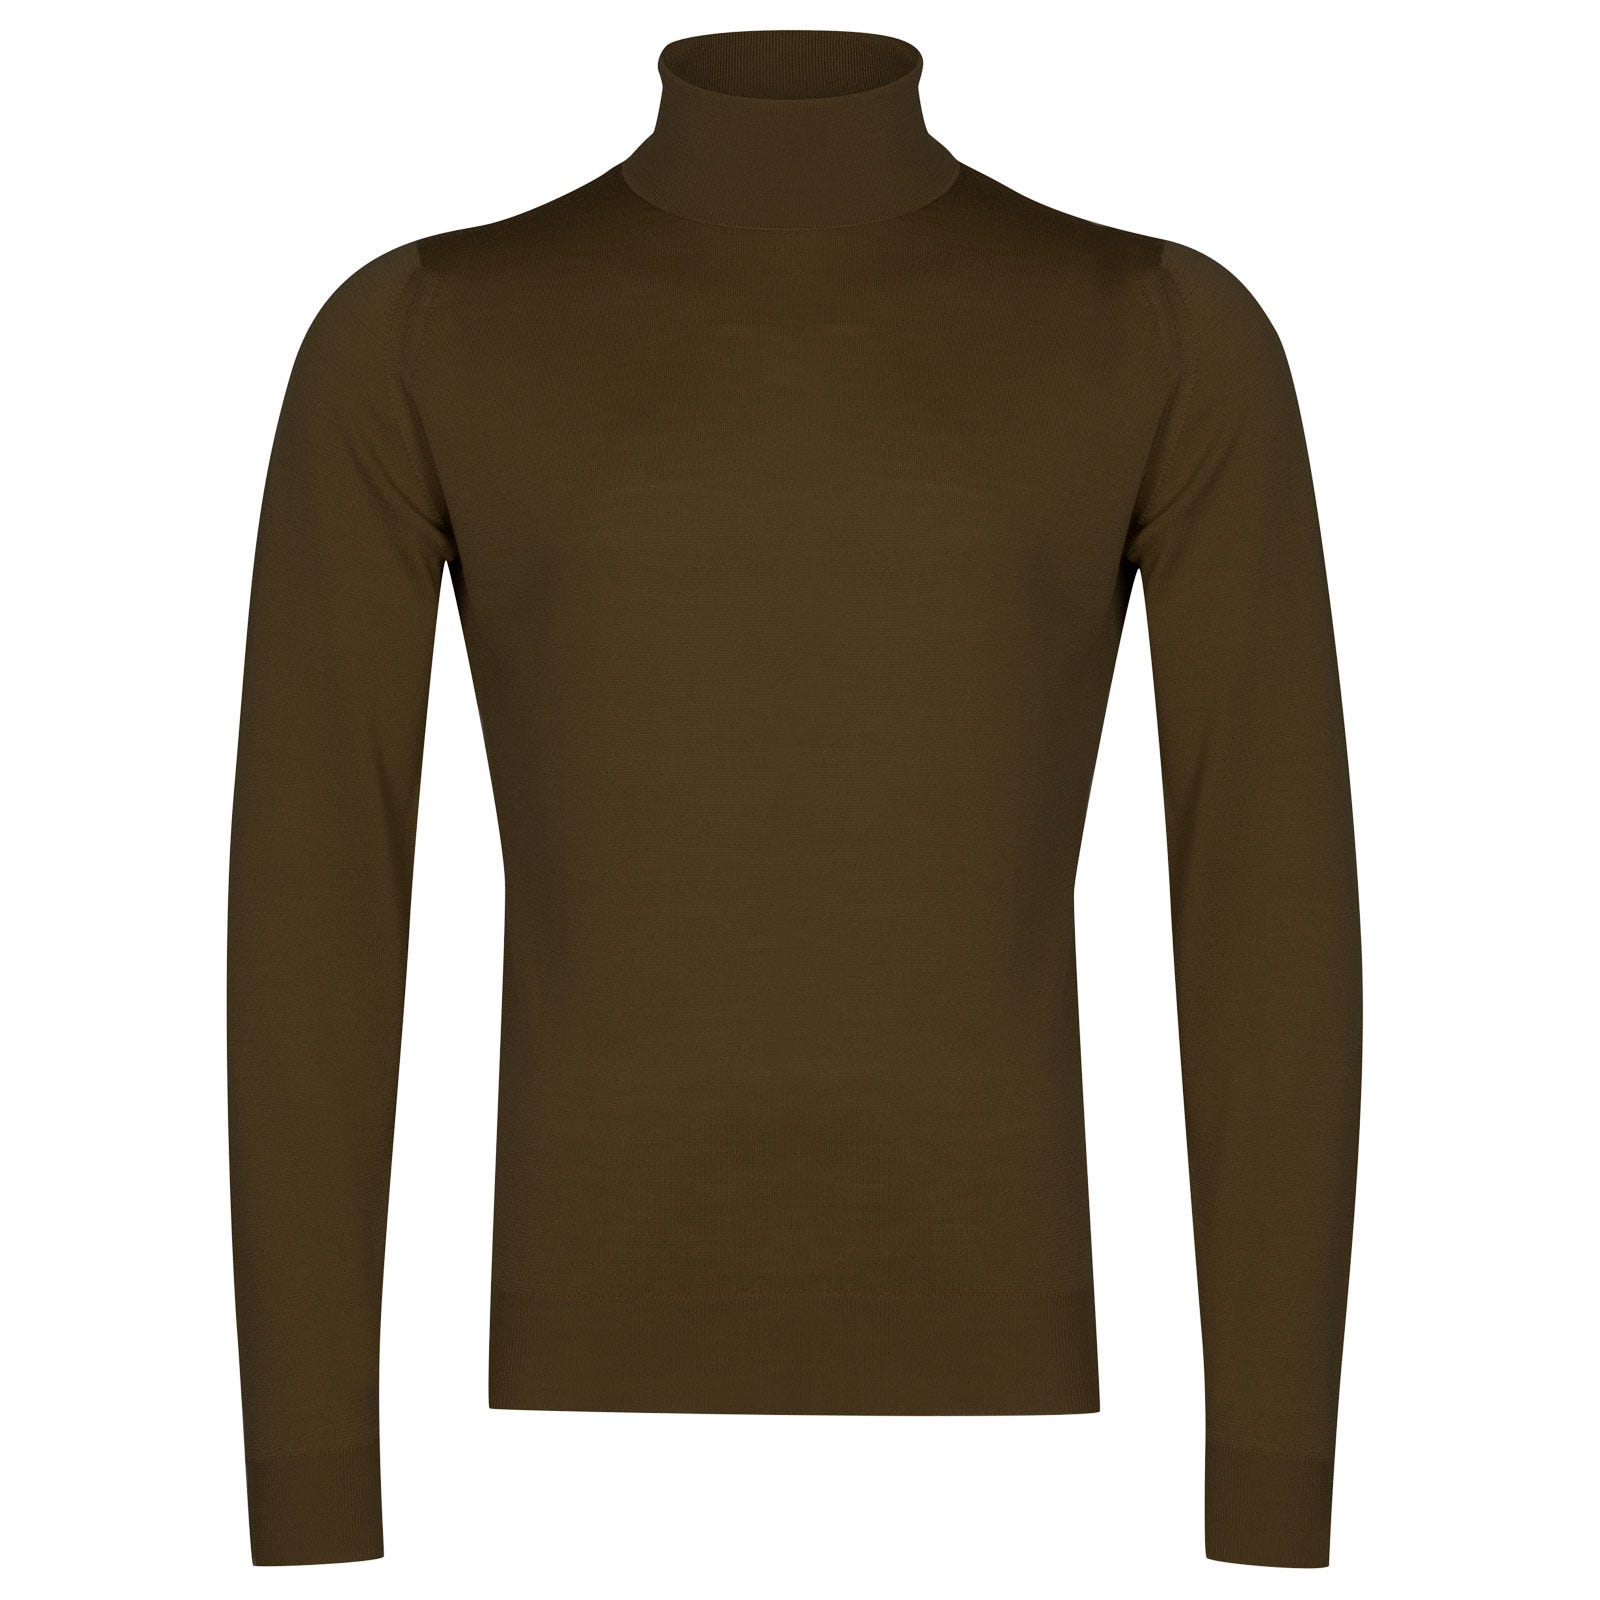 John Smedley cherwell Merino Wool Pullover in Kielder Green-M